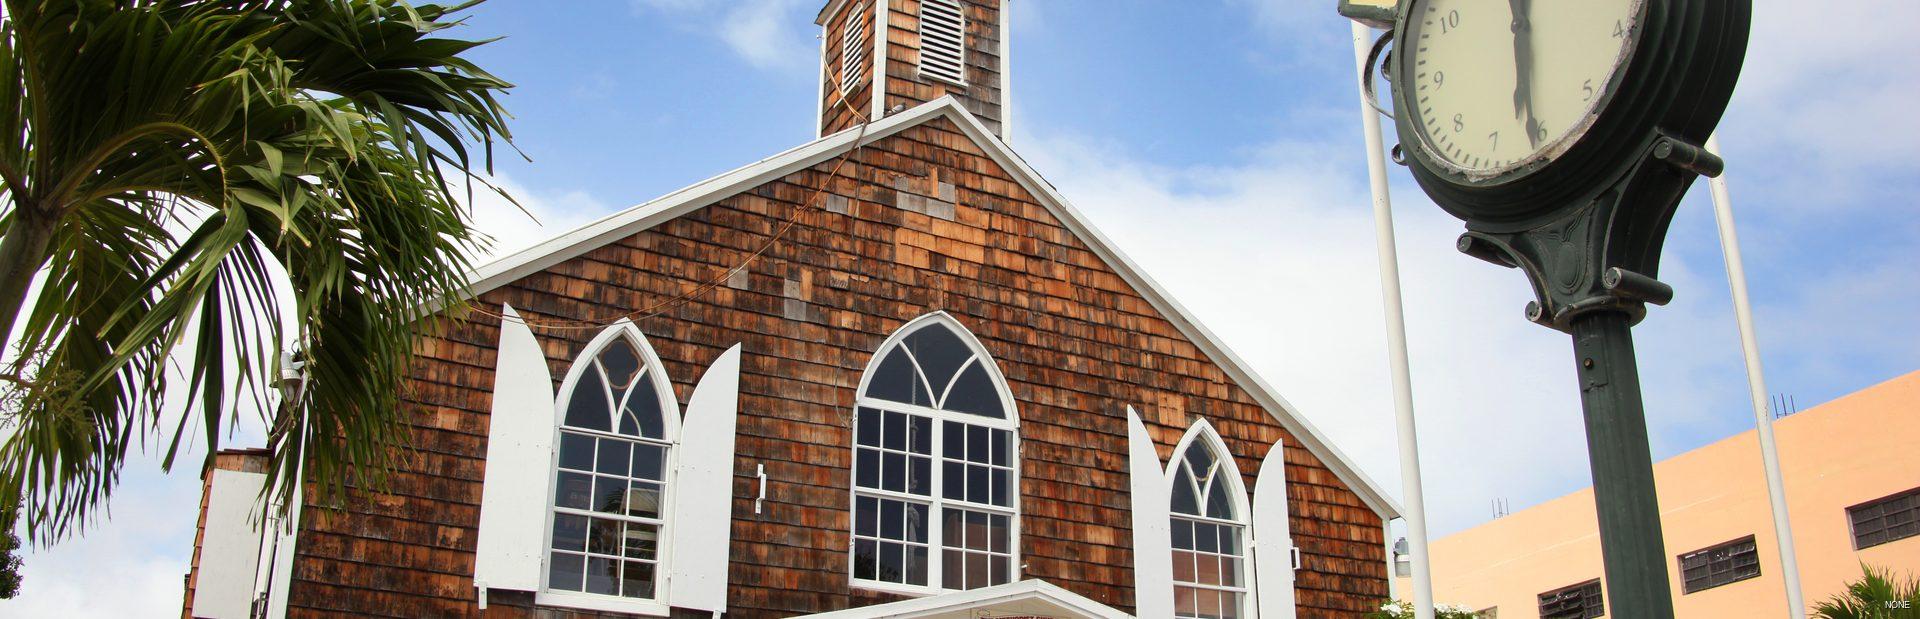 St Barts charter itineraries